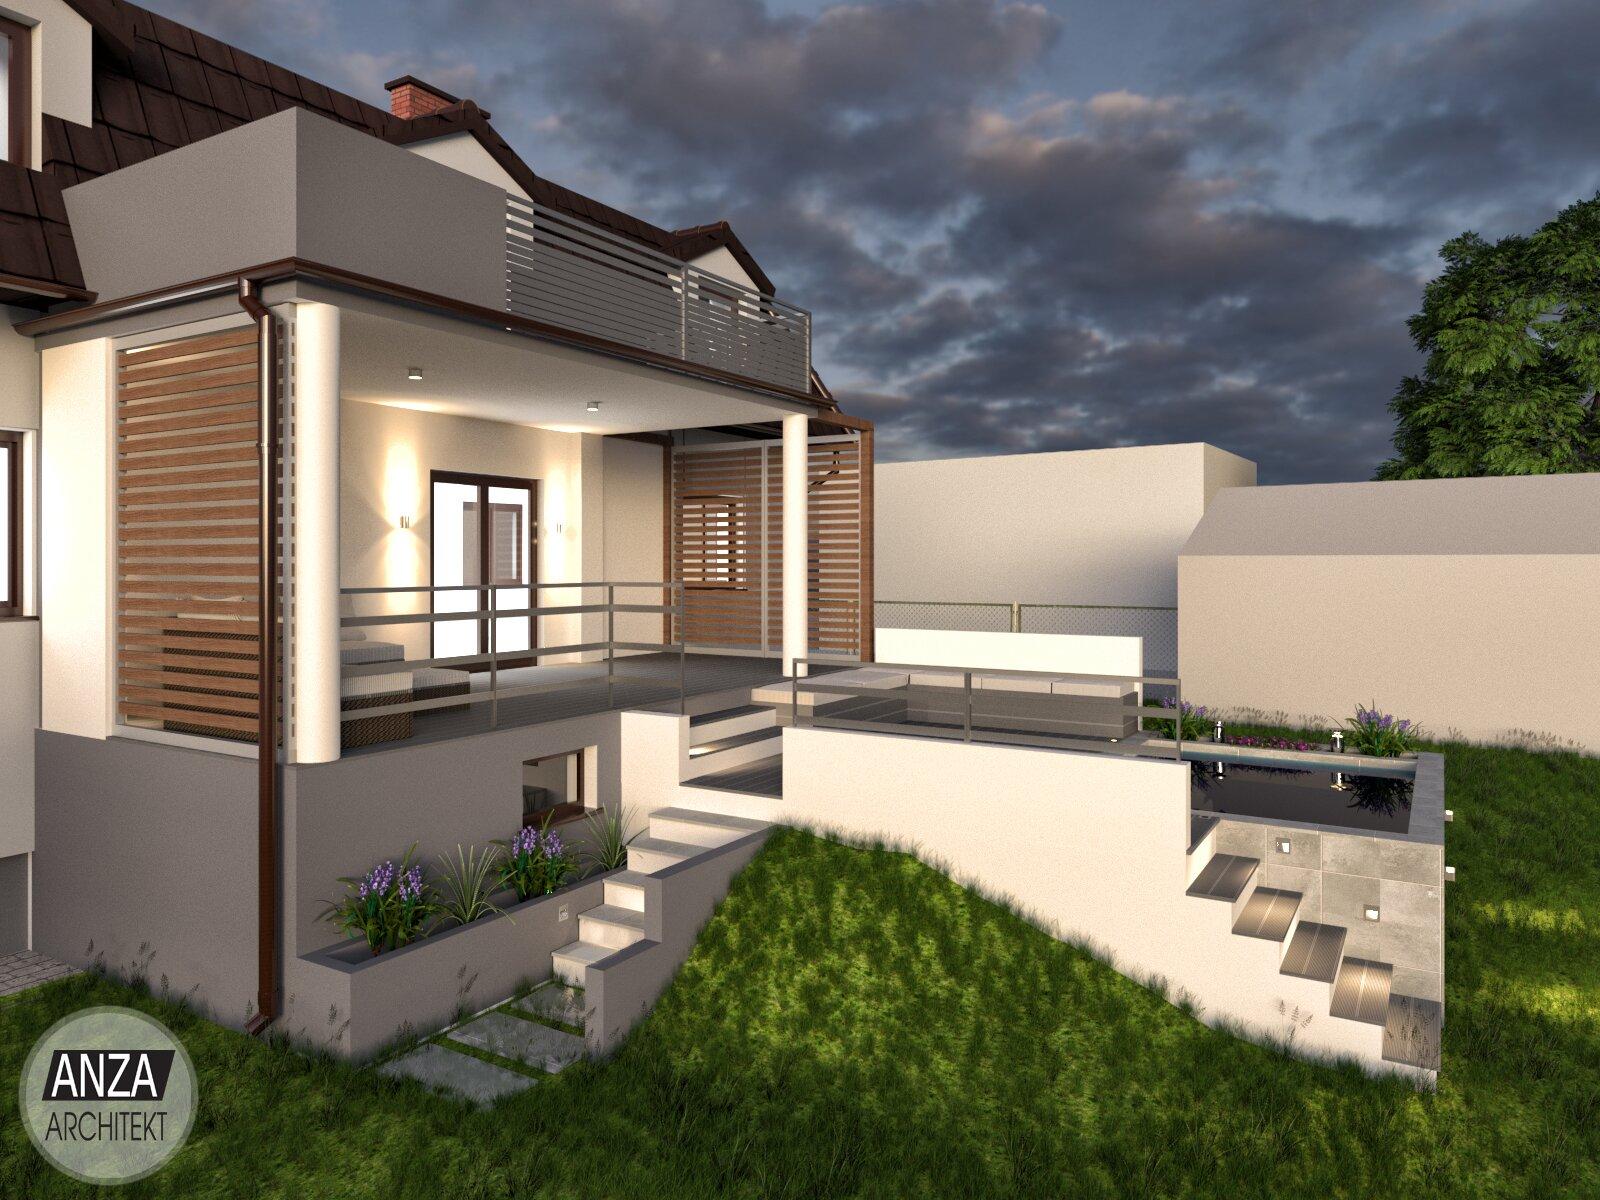 projekt architektoniczny - fabryka